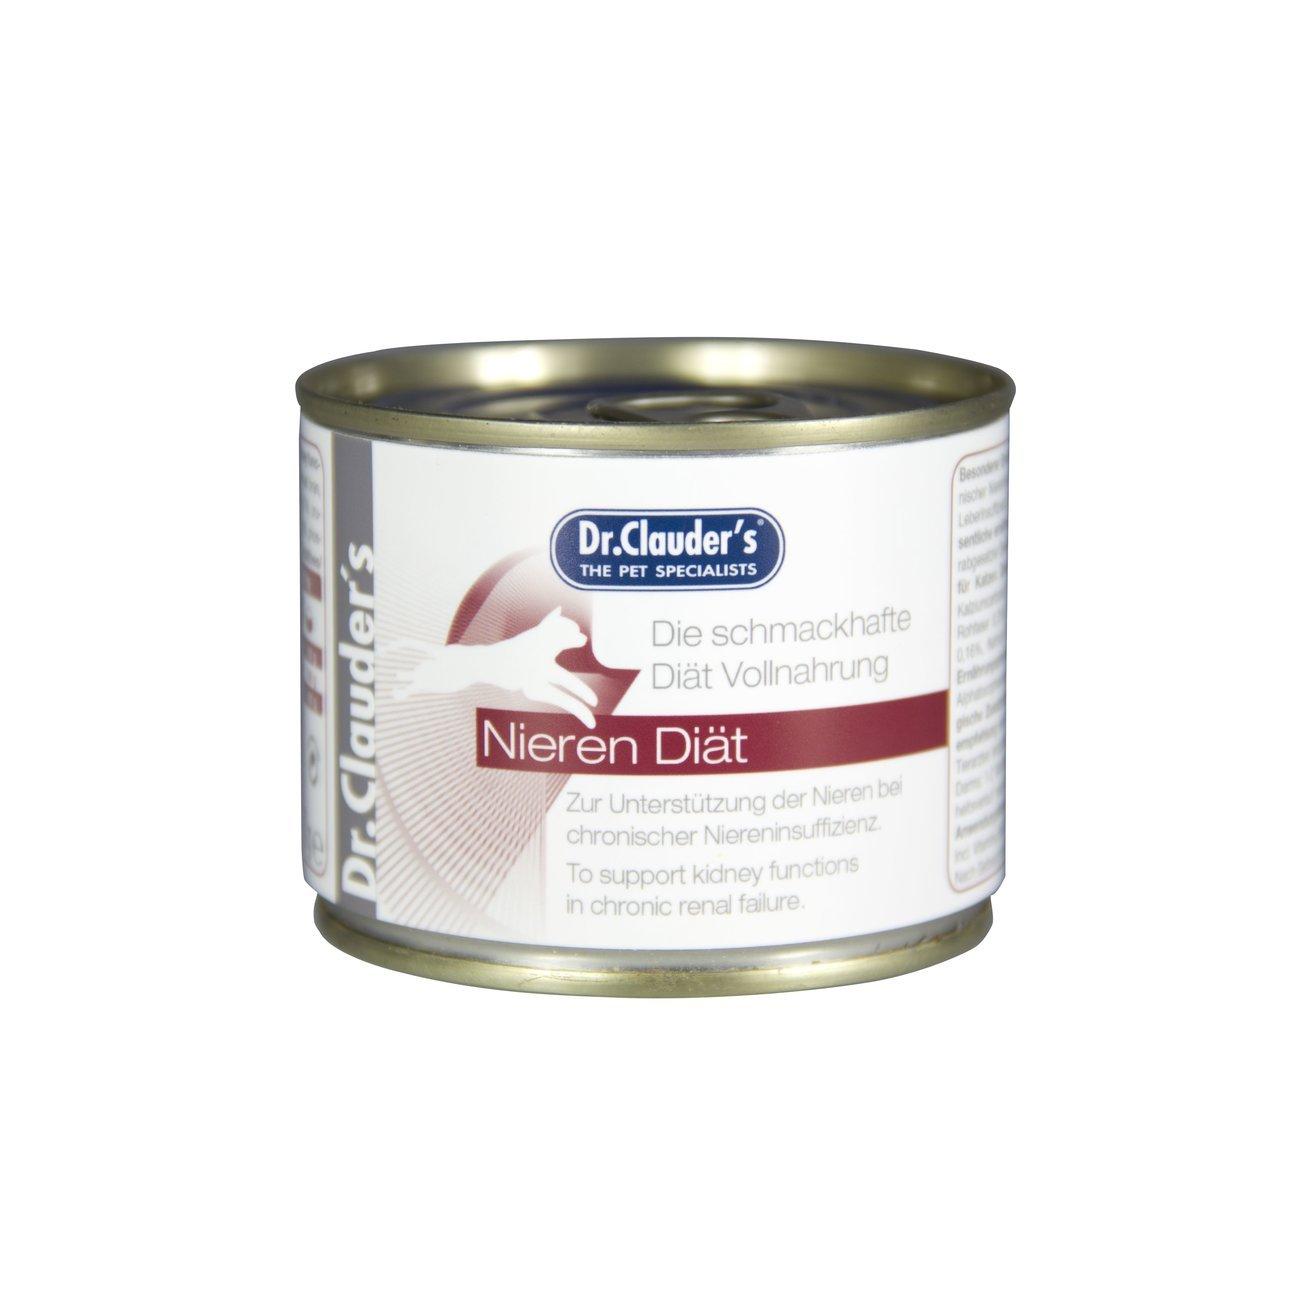 Dr. Clauders High Premium Diät Katzenfutter Dose Bild 4